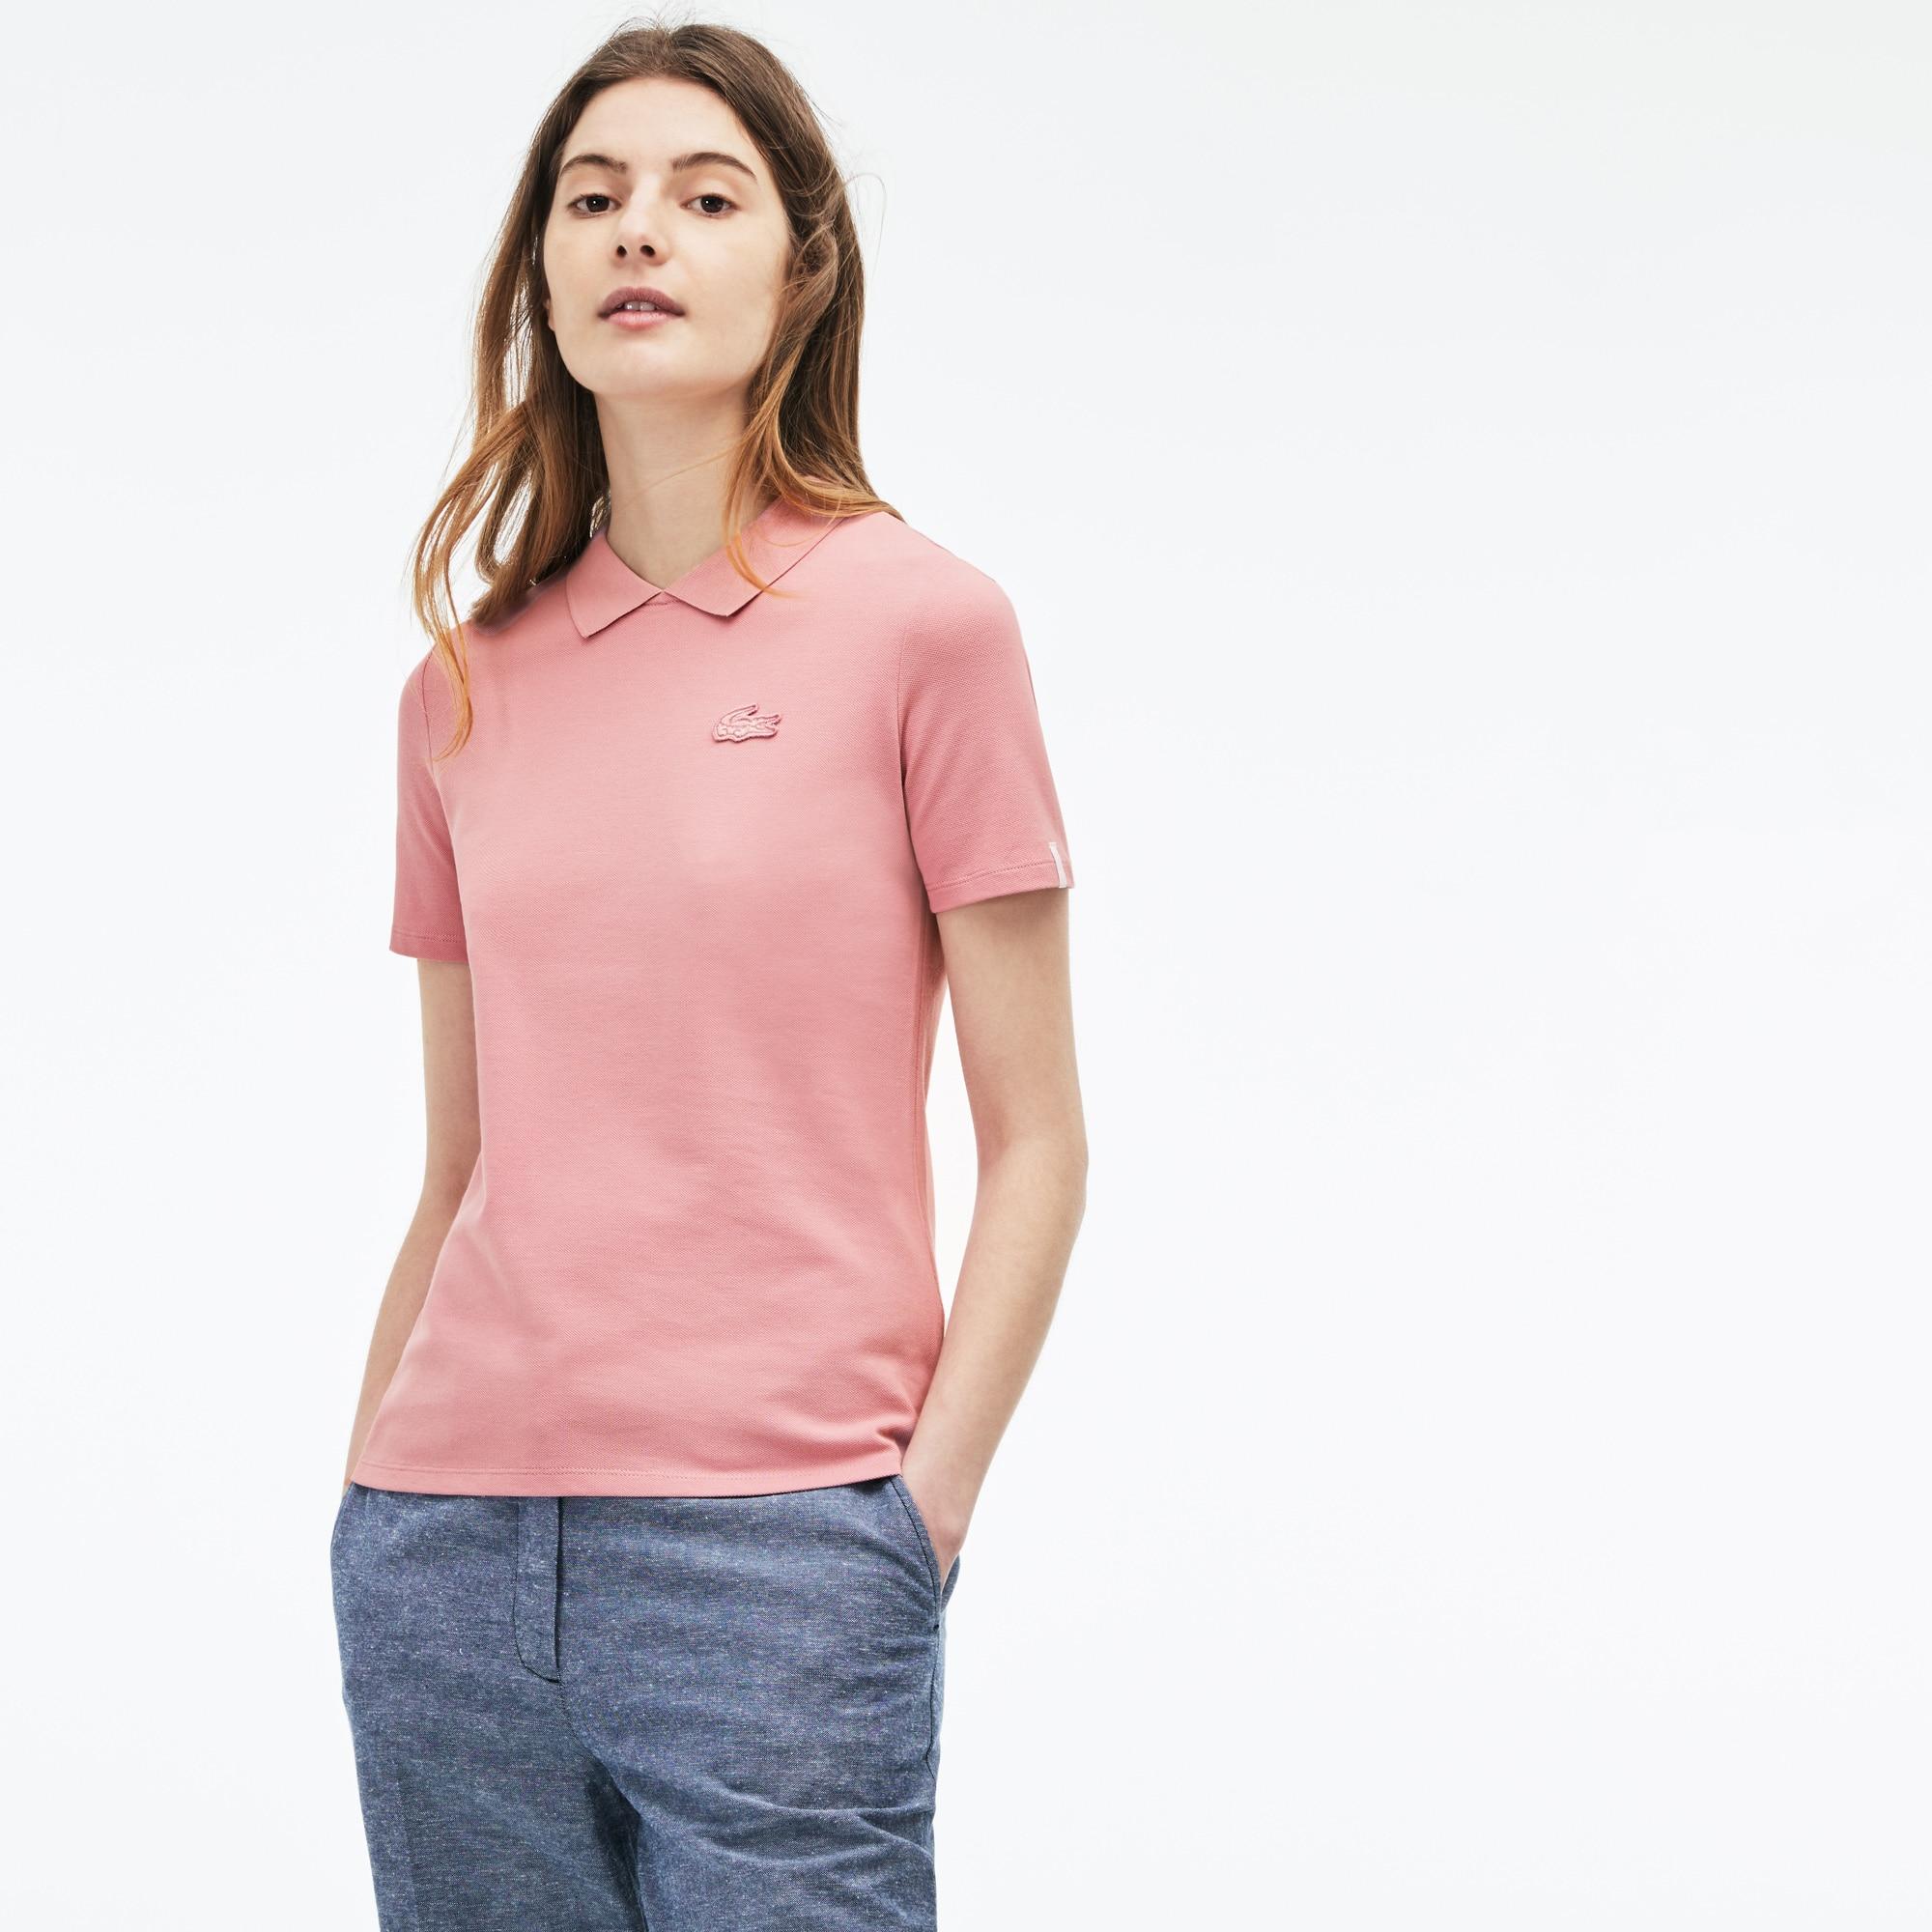 Lacoste Live Polo Live Shirt Polo Lacoste Live Shirt Shirt Sale Lacoste Polo Sale Pyvm8n0wNO